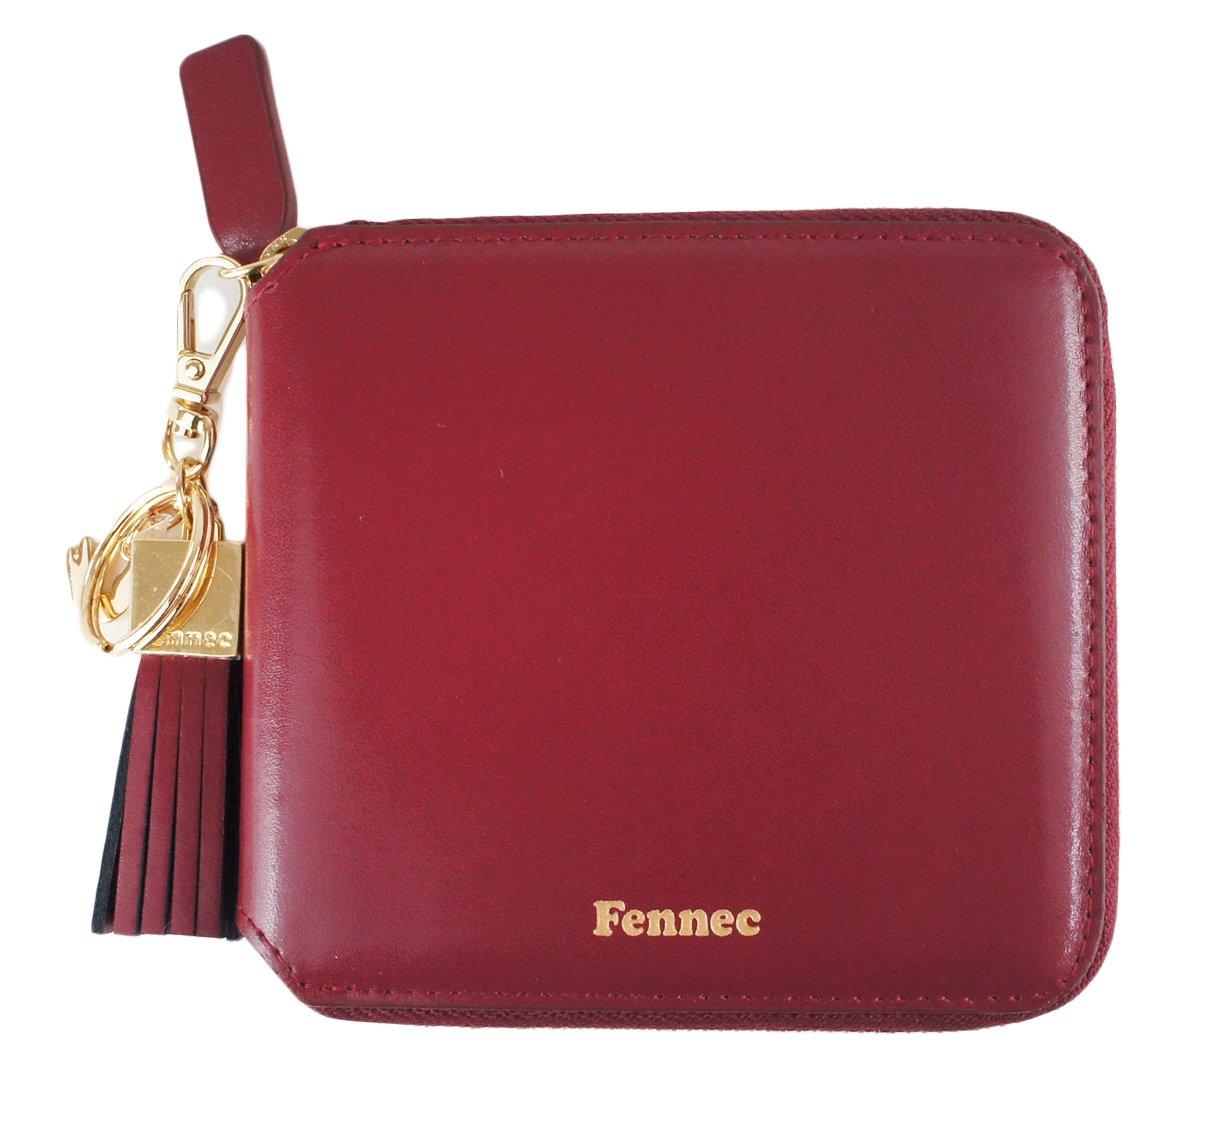 Fennec Zipper Wallet Square Tassel フェネック 二つ折り財布 コインケース付き 【Fennec OFFICIAL】 B0765RVMY8 マルサラ マルサラ